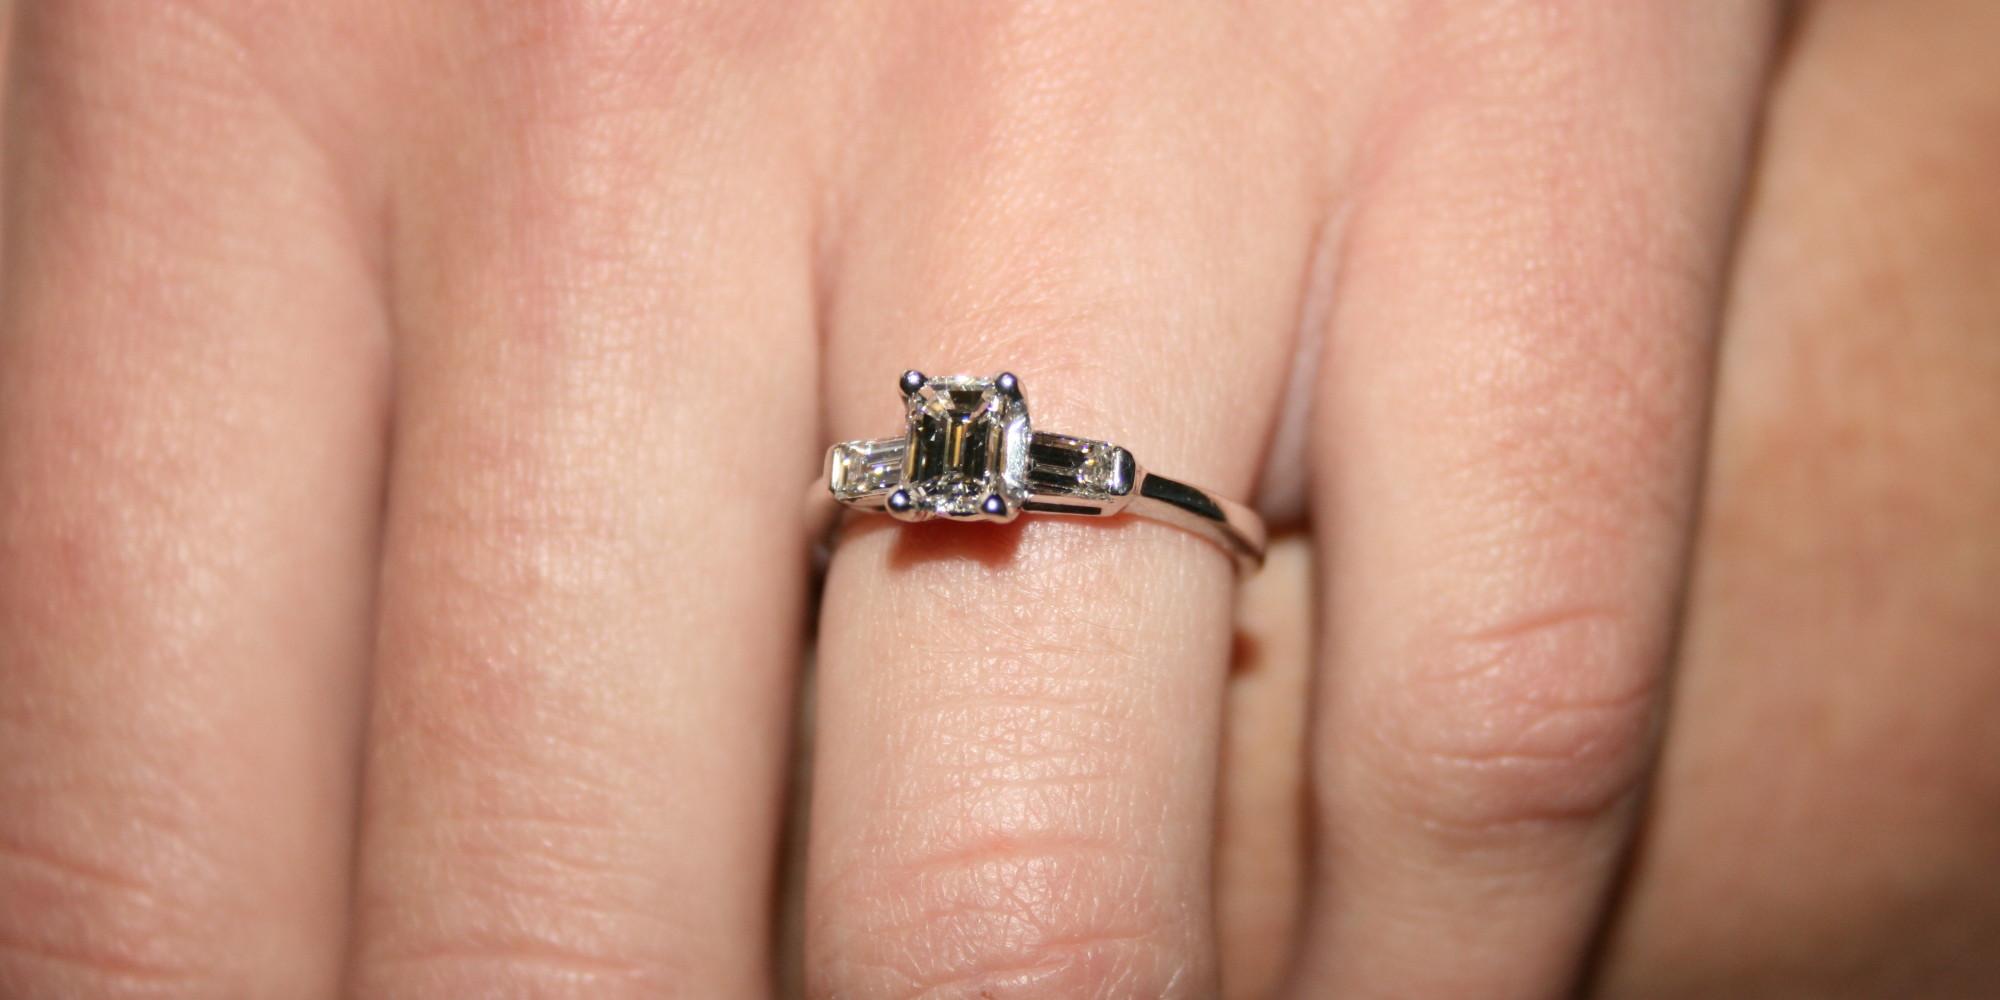 facebook engagement posts b pretty wedding rings